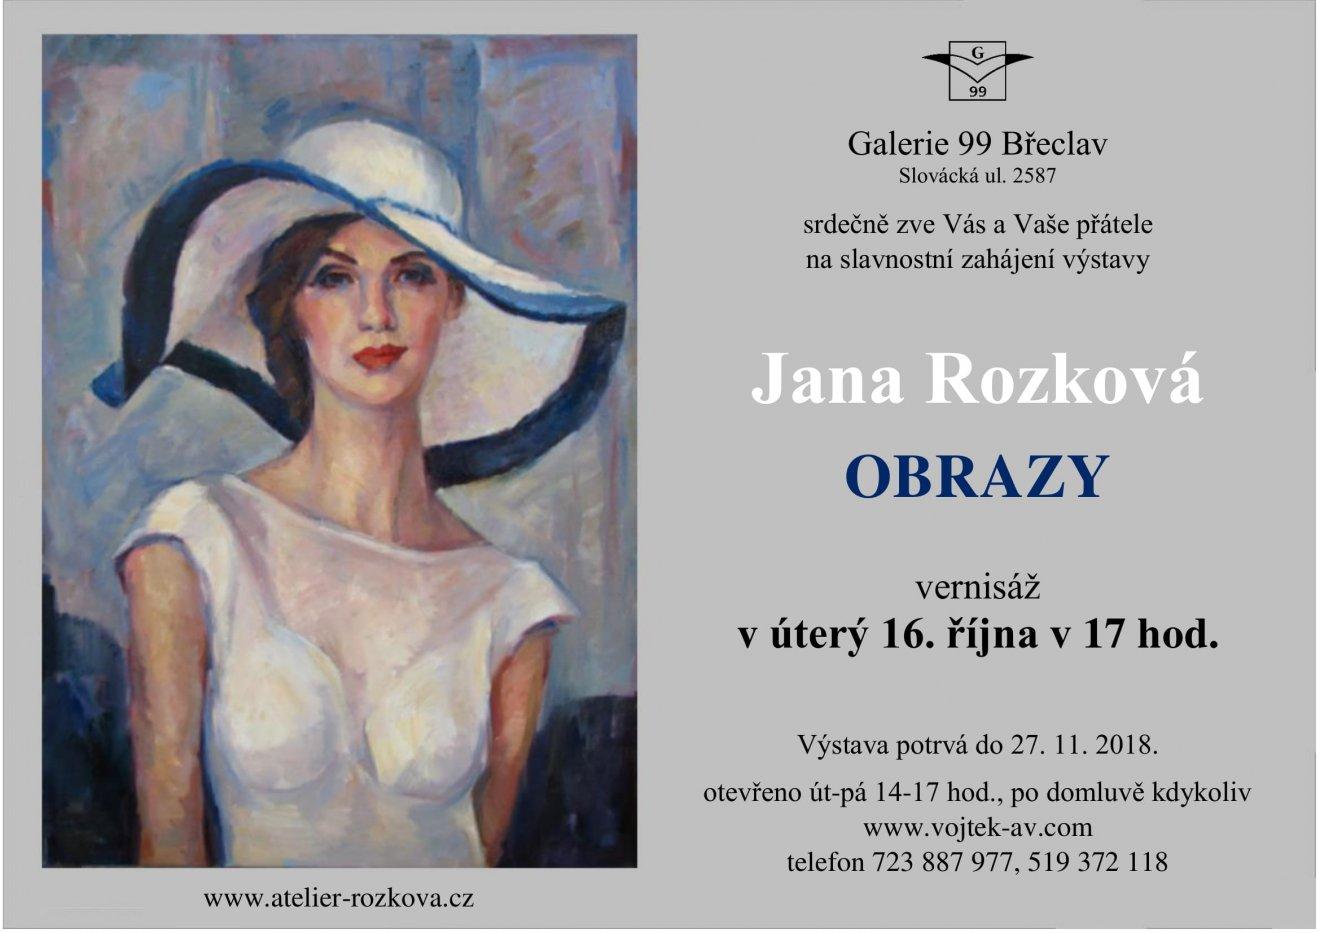 jana_rozkova_vernisaz2018_breclav